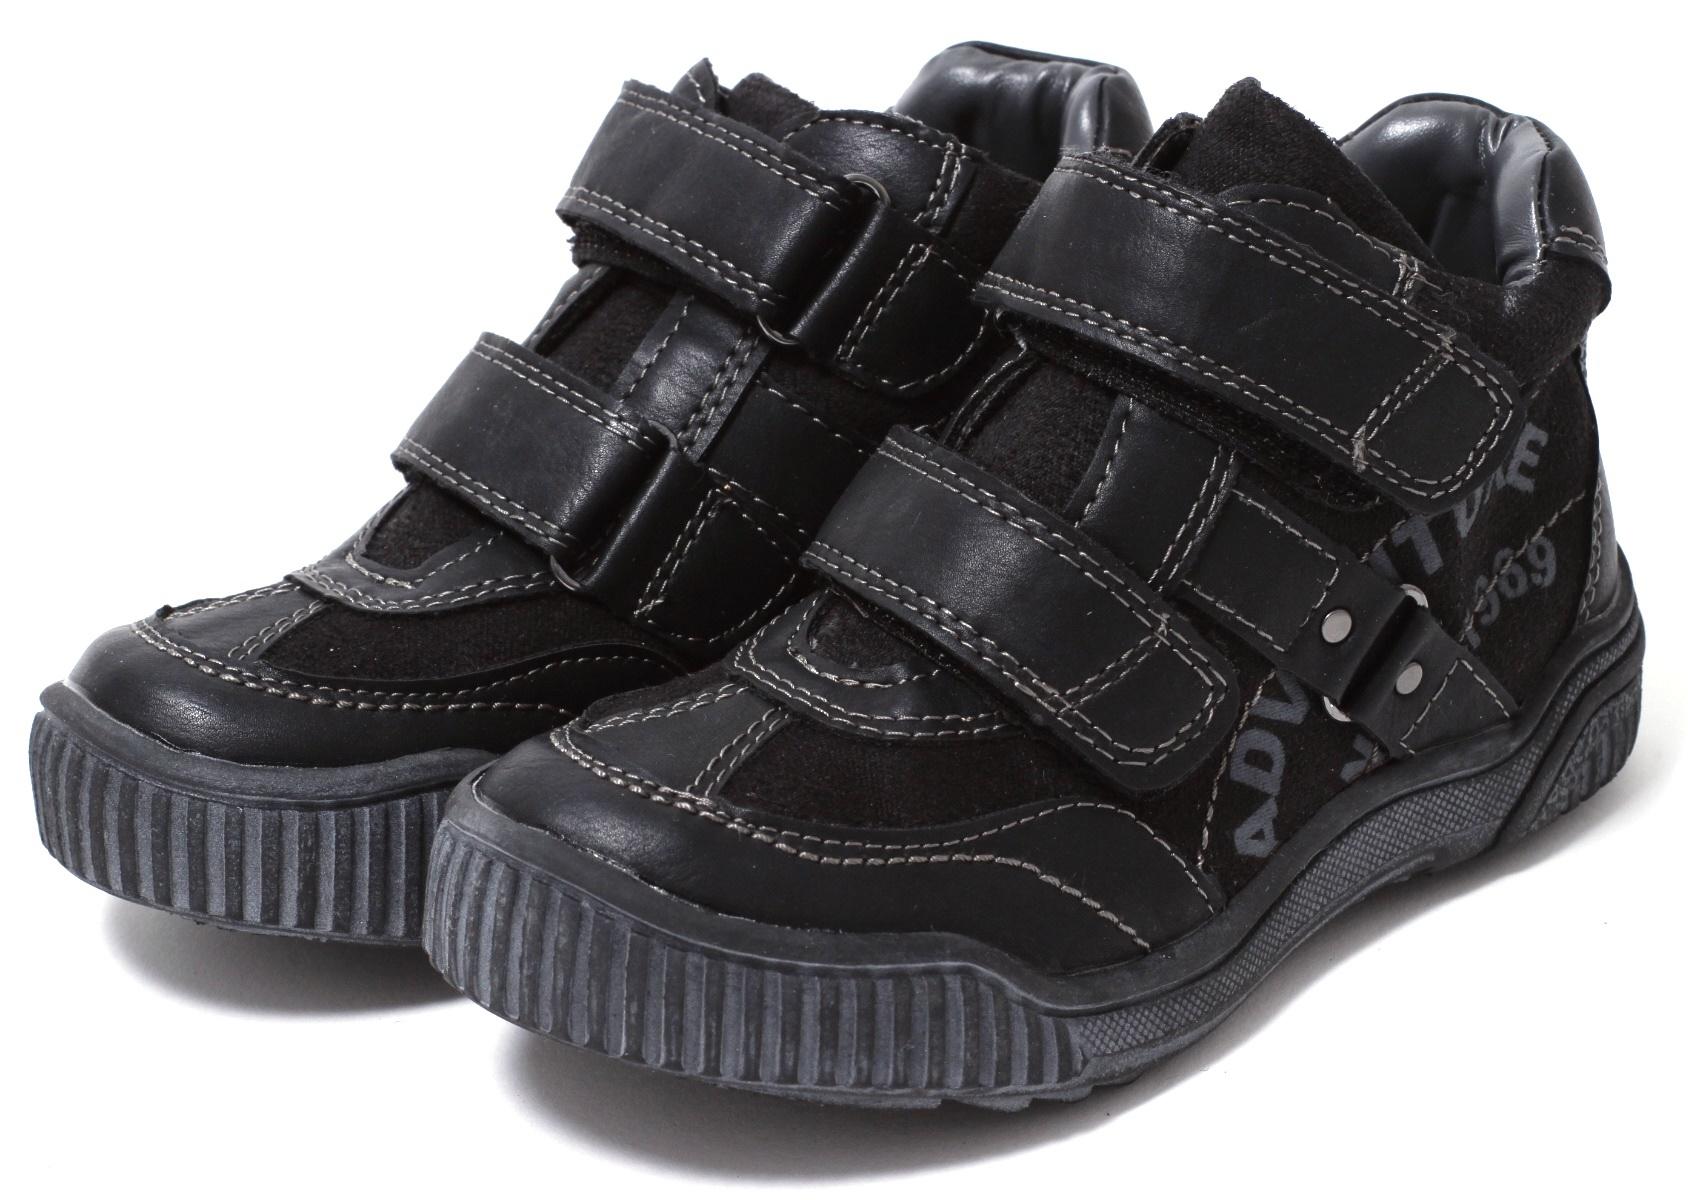 online retailer 67b7f f9a8d Jungen Stiefel Gr 25-27 Boots Kinder Schuhe Winterstiefel warm gefüttert  schwarz